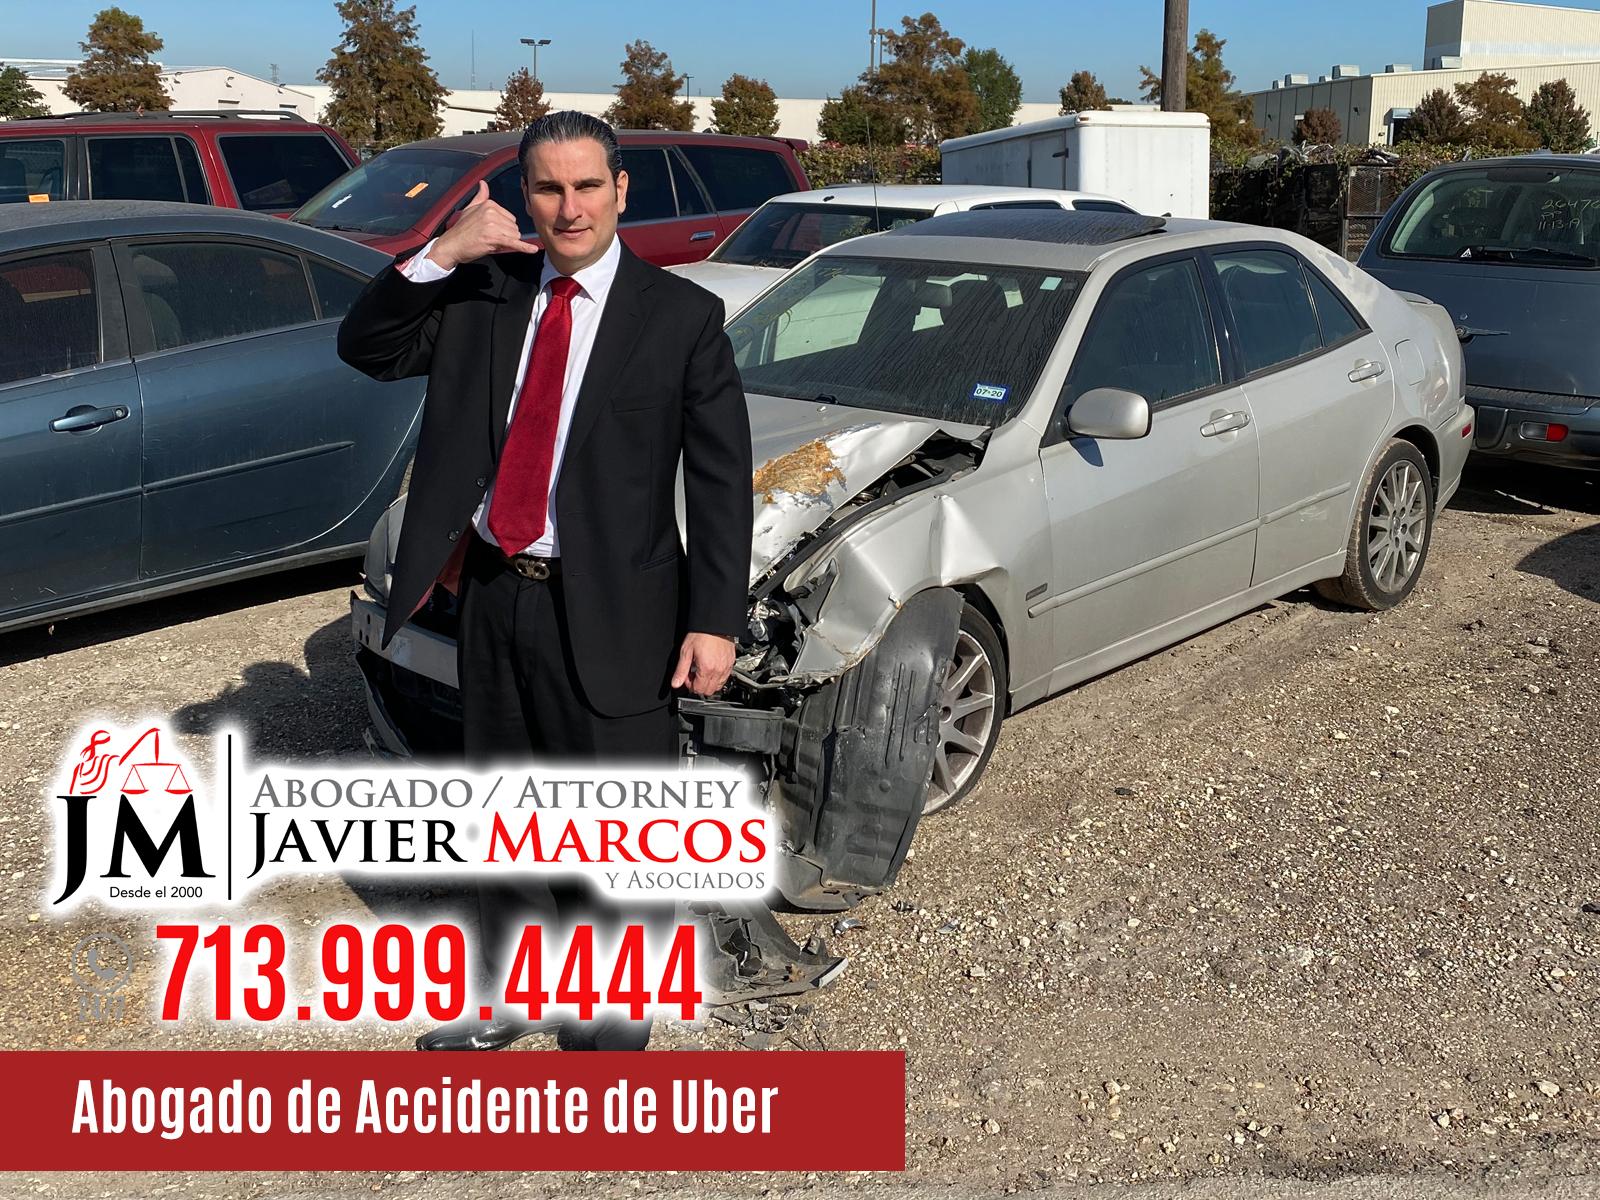 Abogado de Accidente de Uber | Abogado Javier Marcos | 713.999.4444